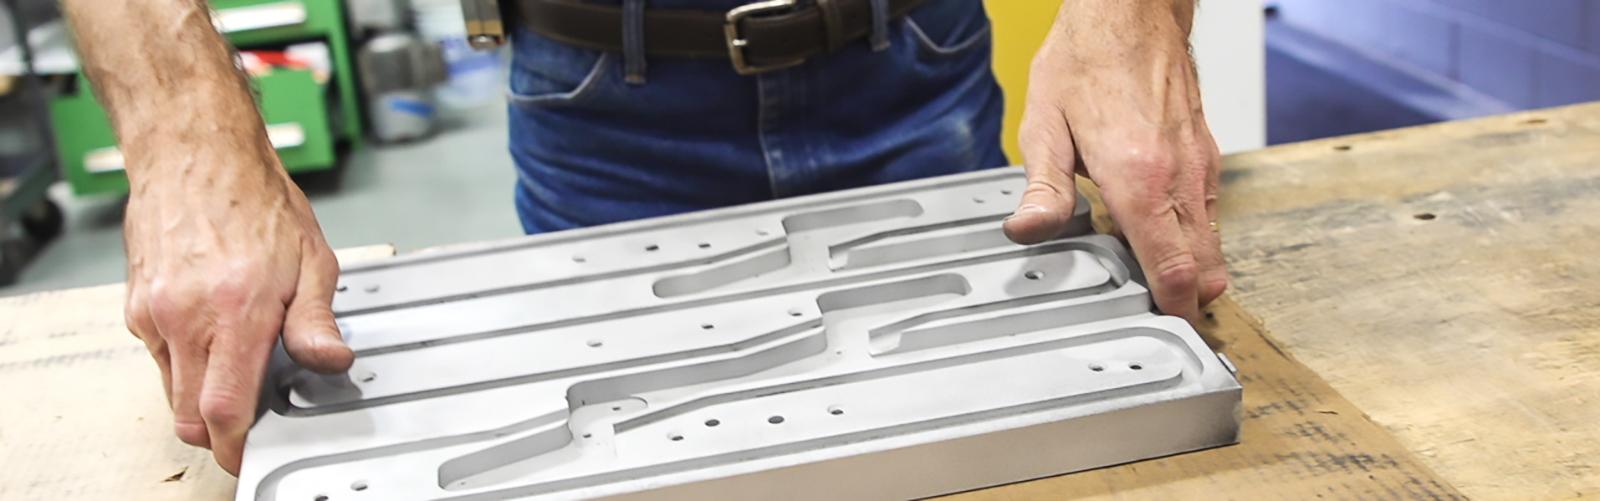 Multivac heater fabrication